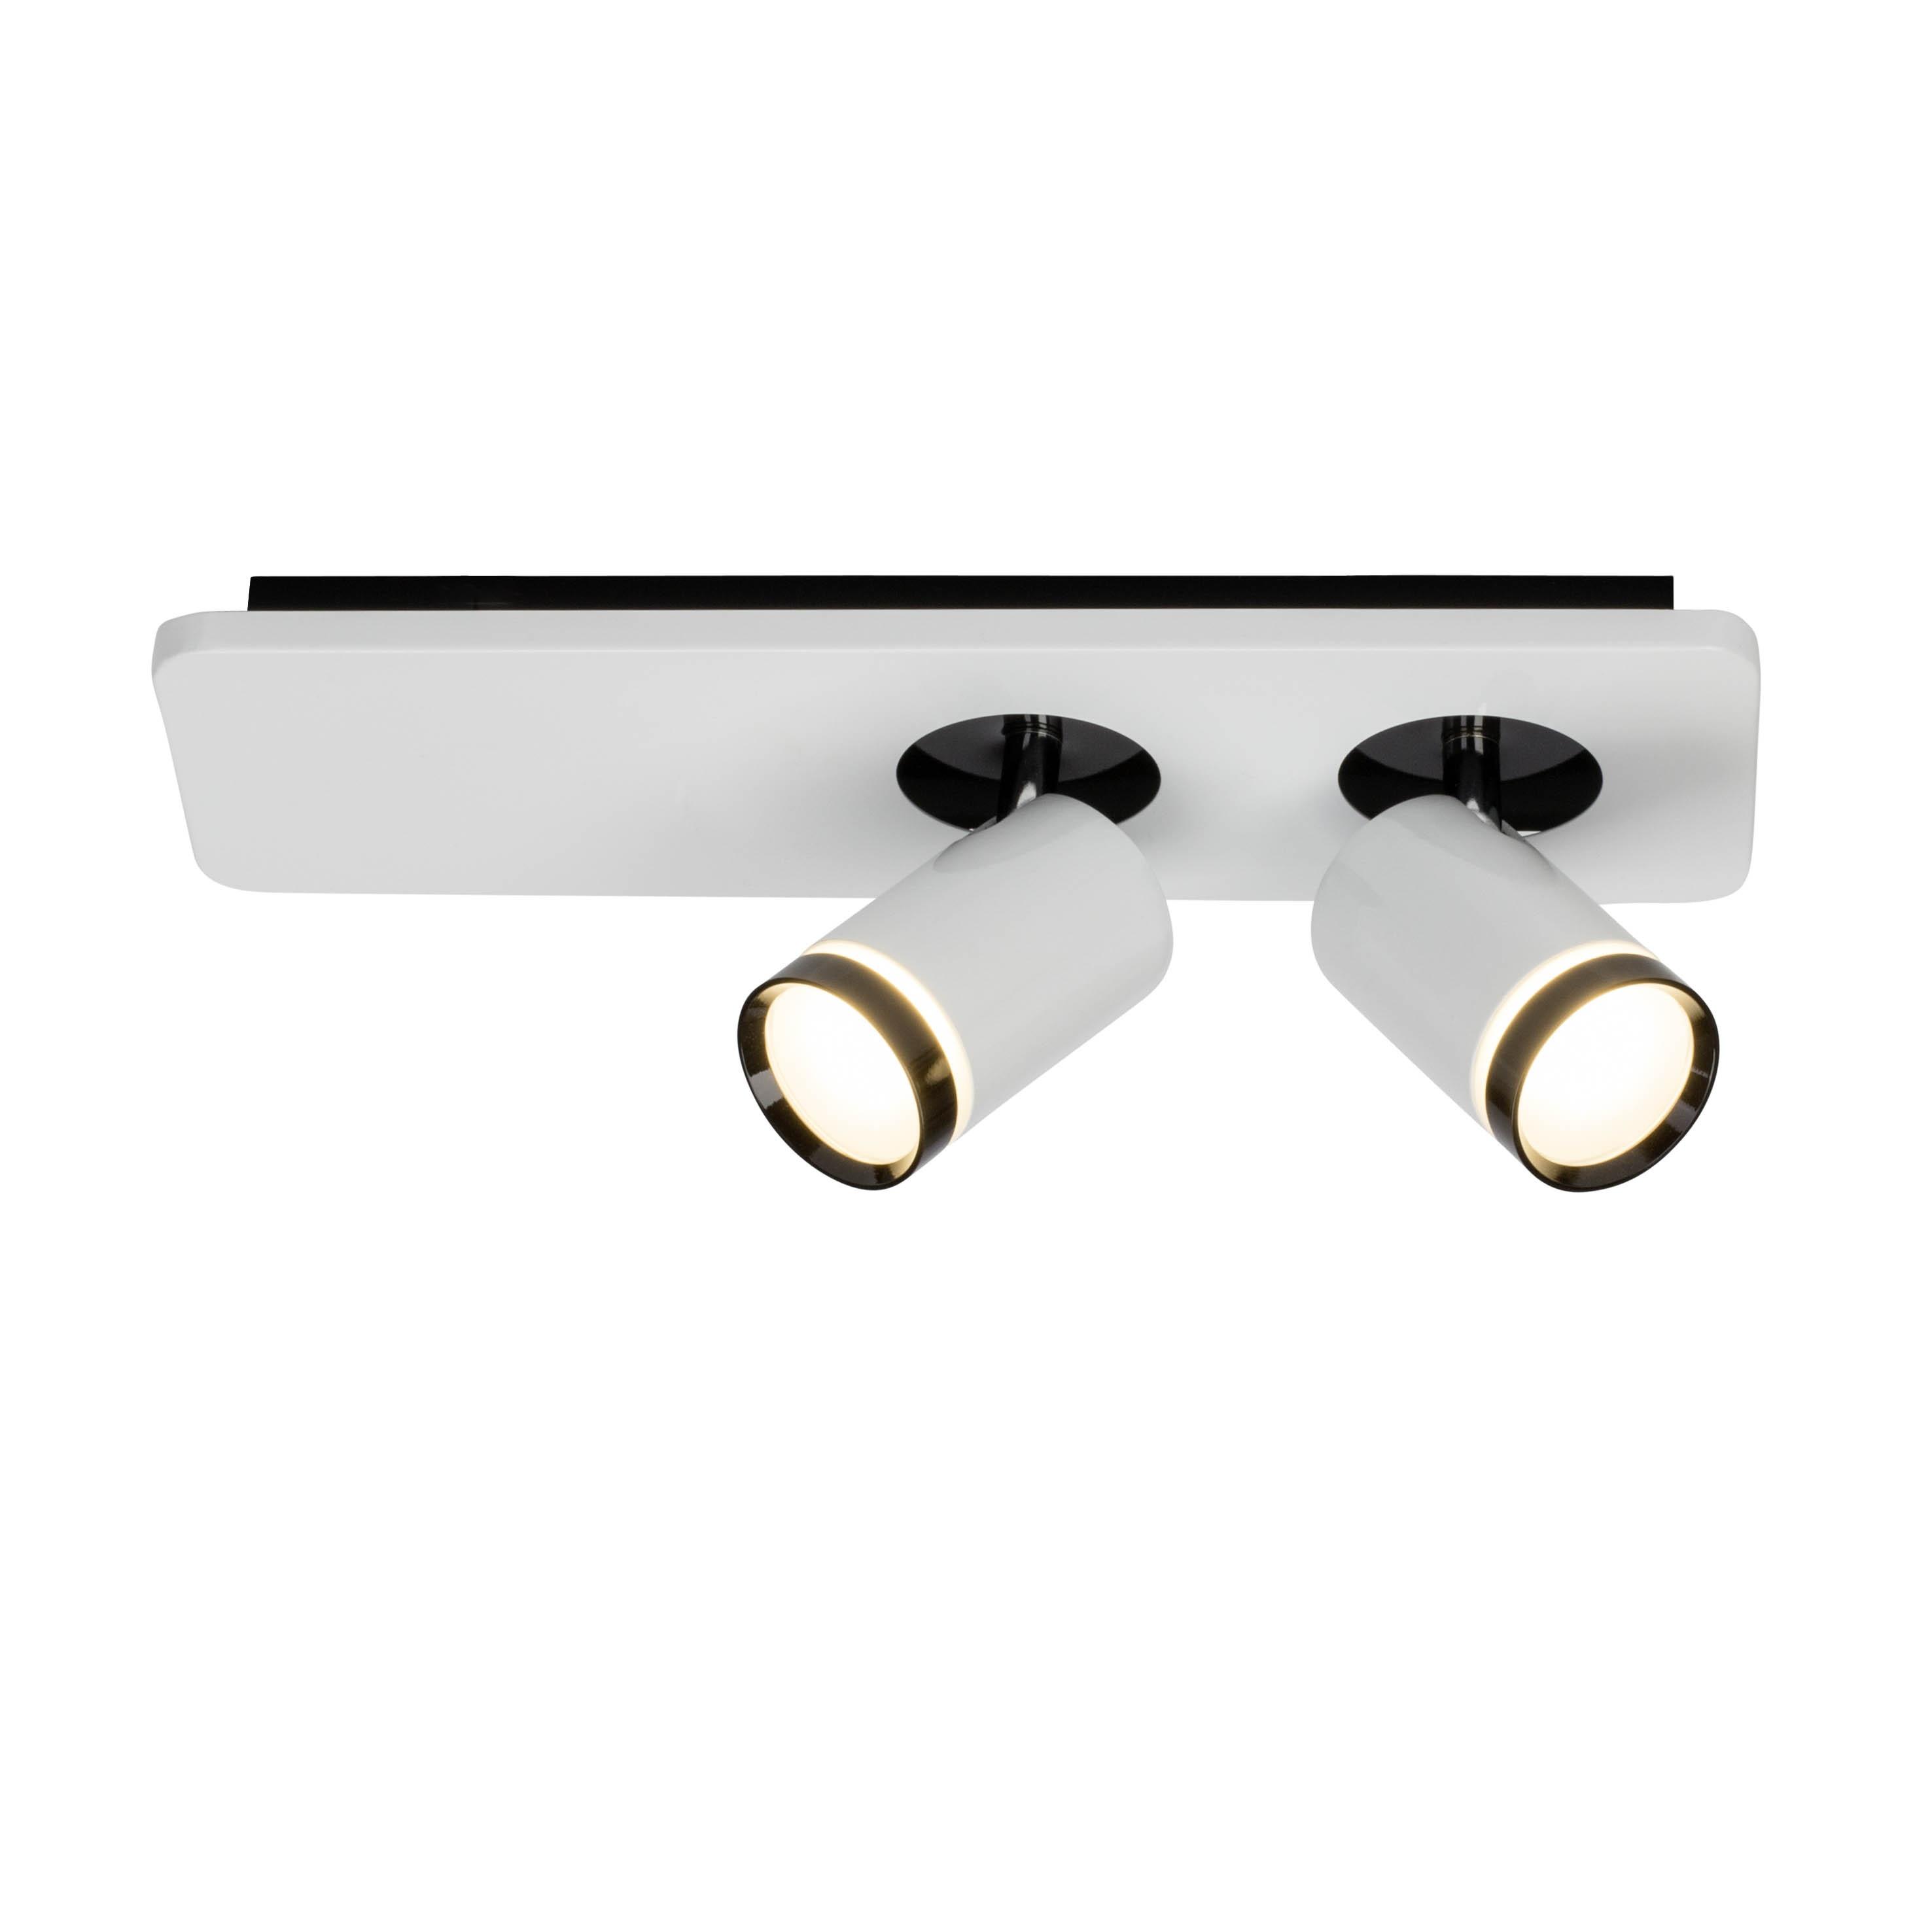 AEG Sol LED Spotbalken 2flg weiß-glänzend/schwarz